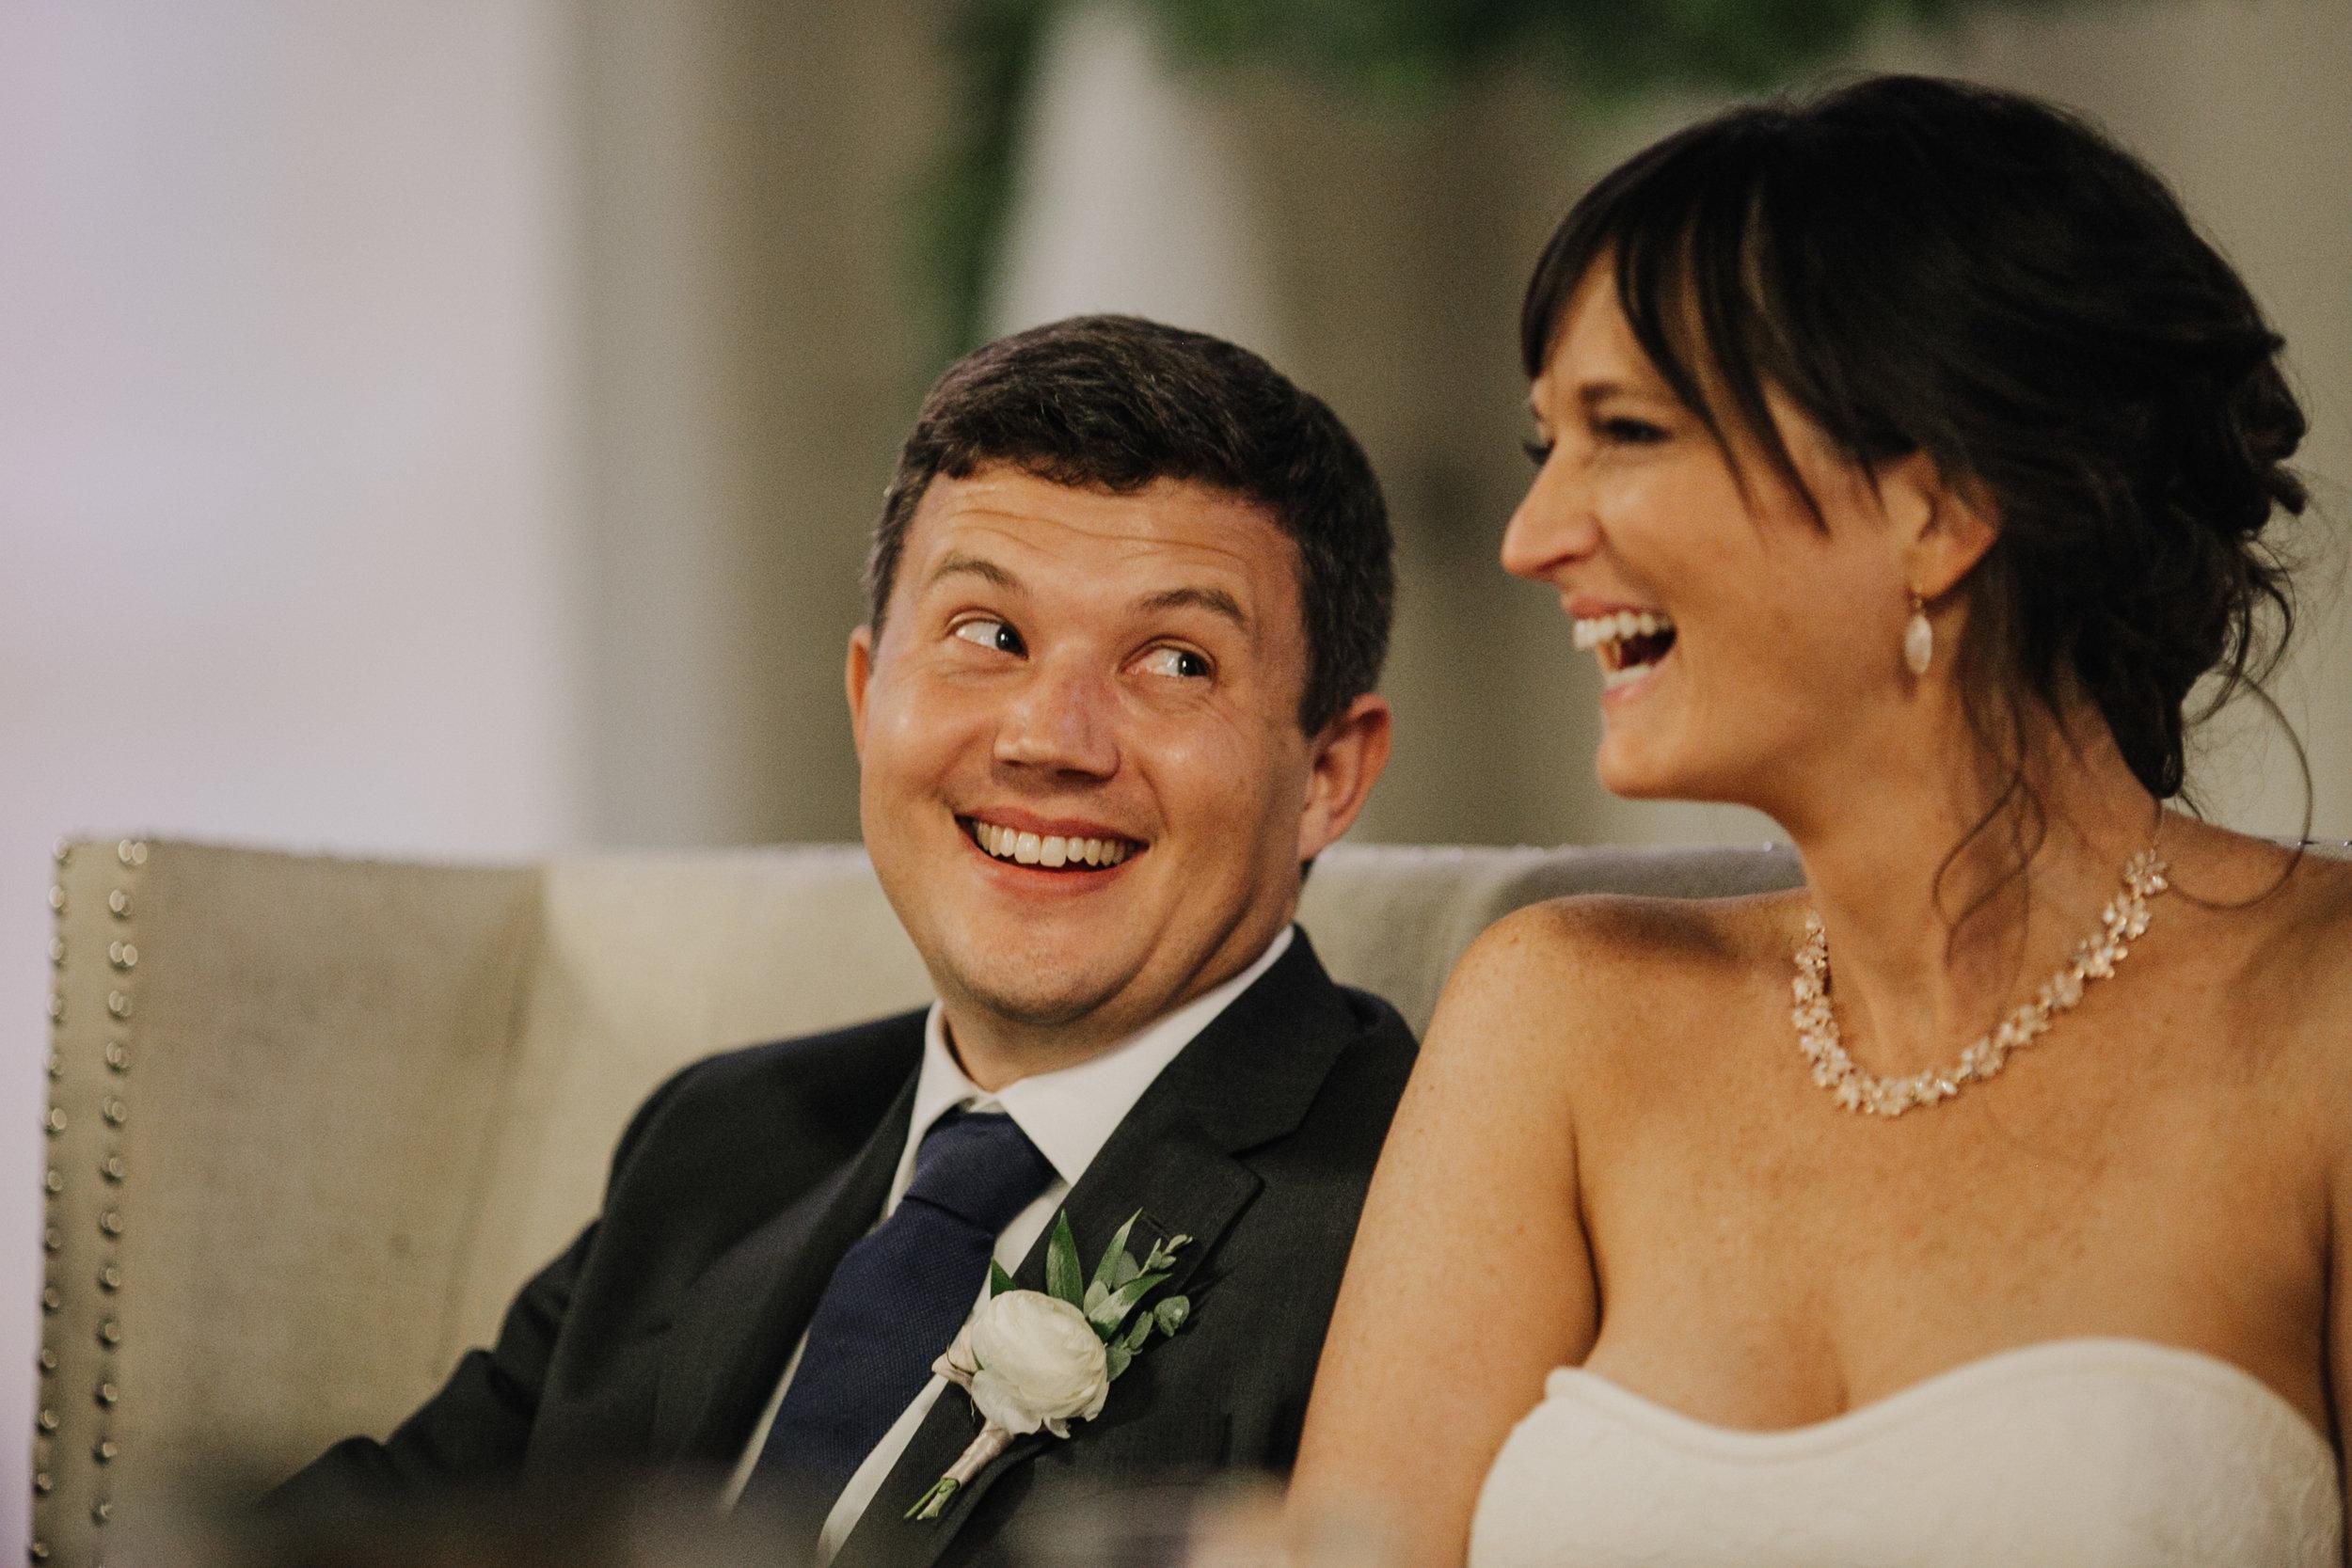 matthews-wedding-529.jpg